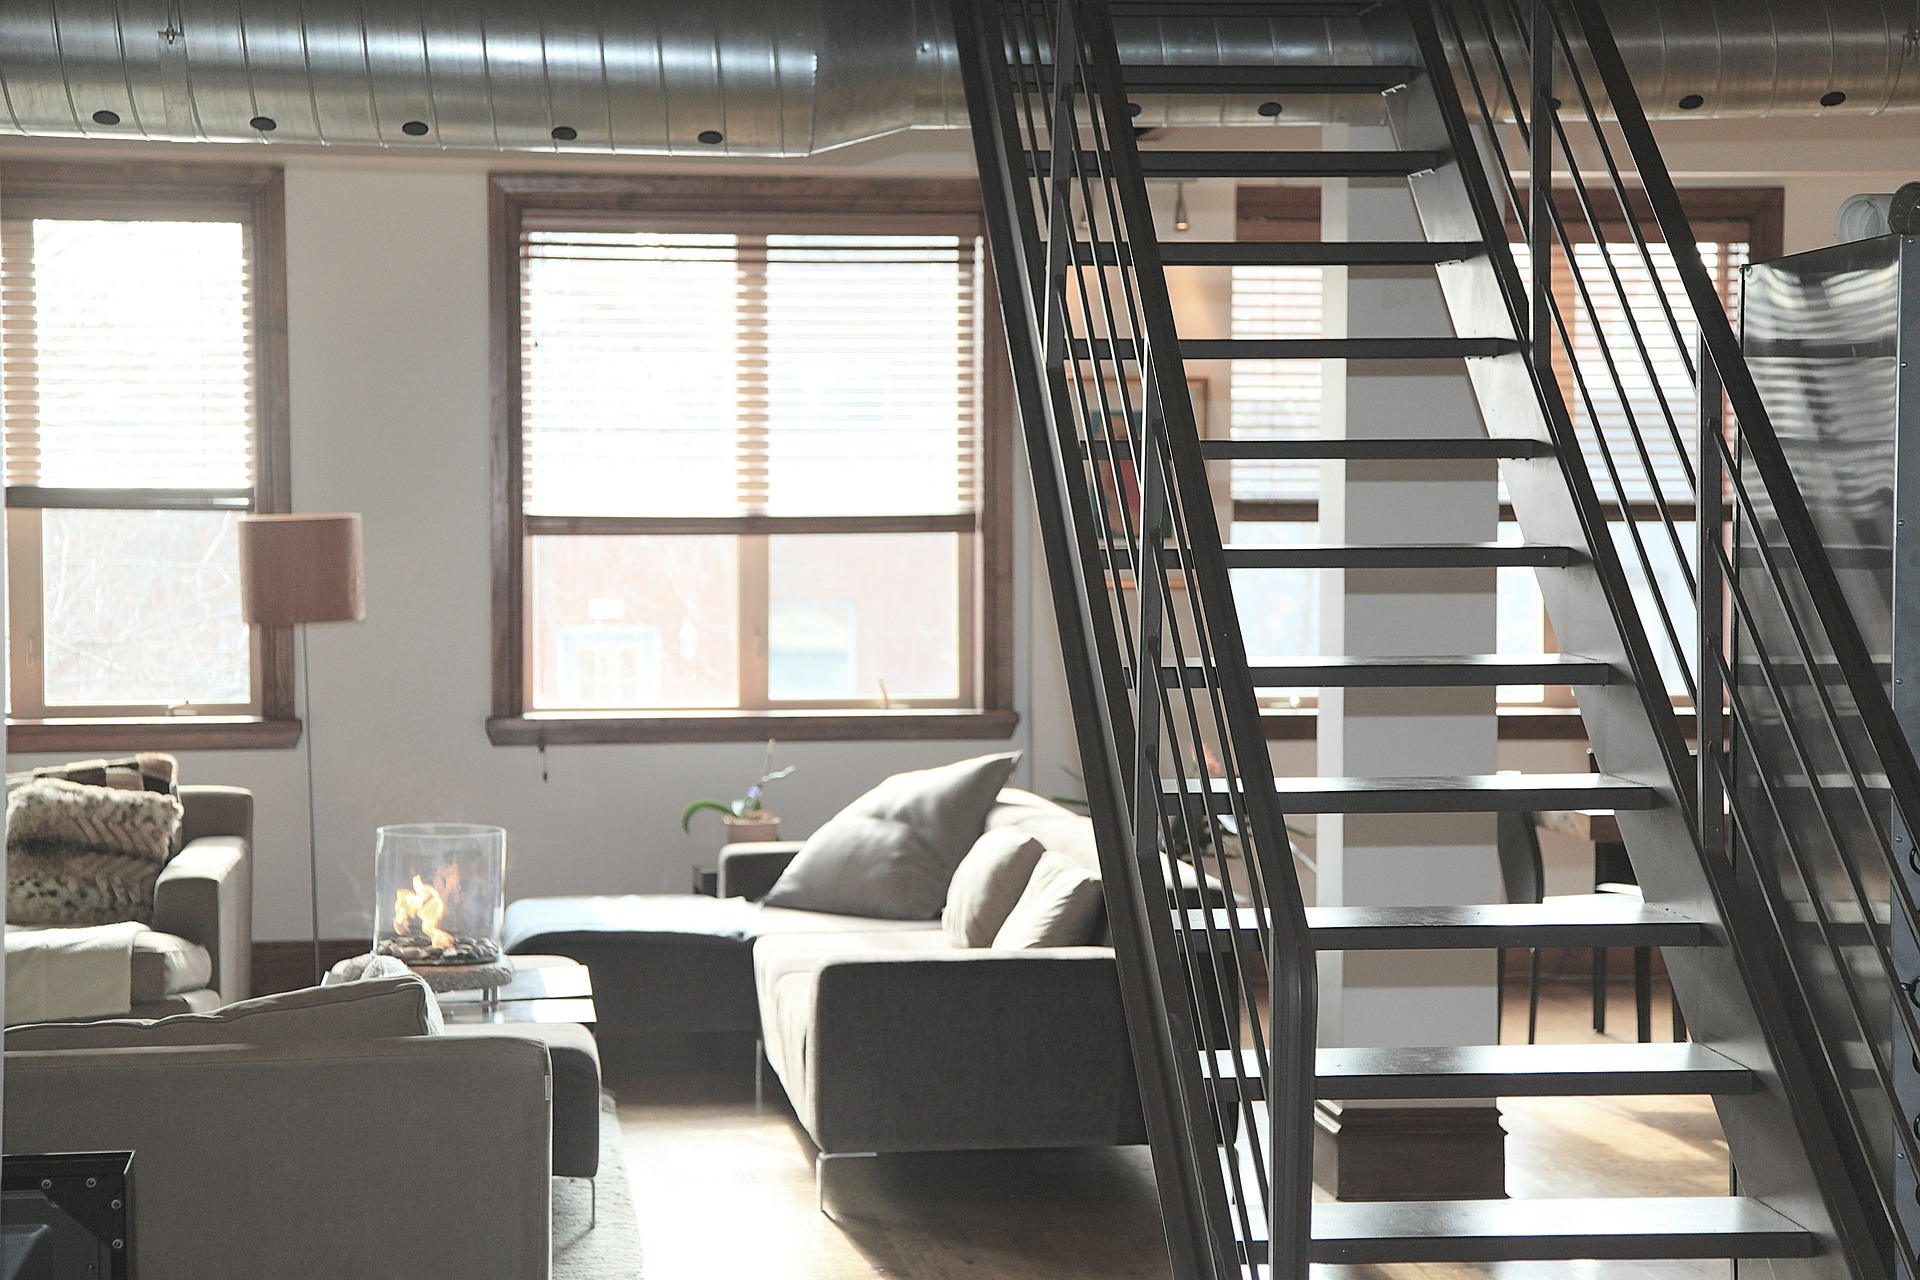 apartment-406901_1920(1), value home improvement loan